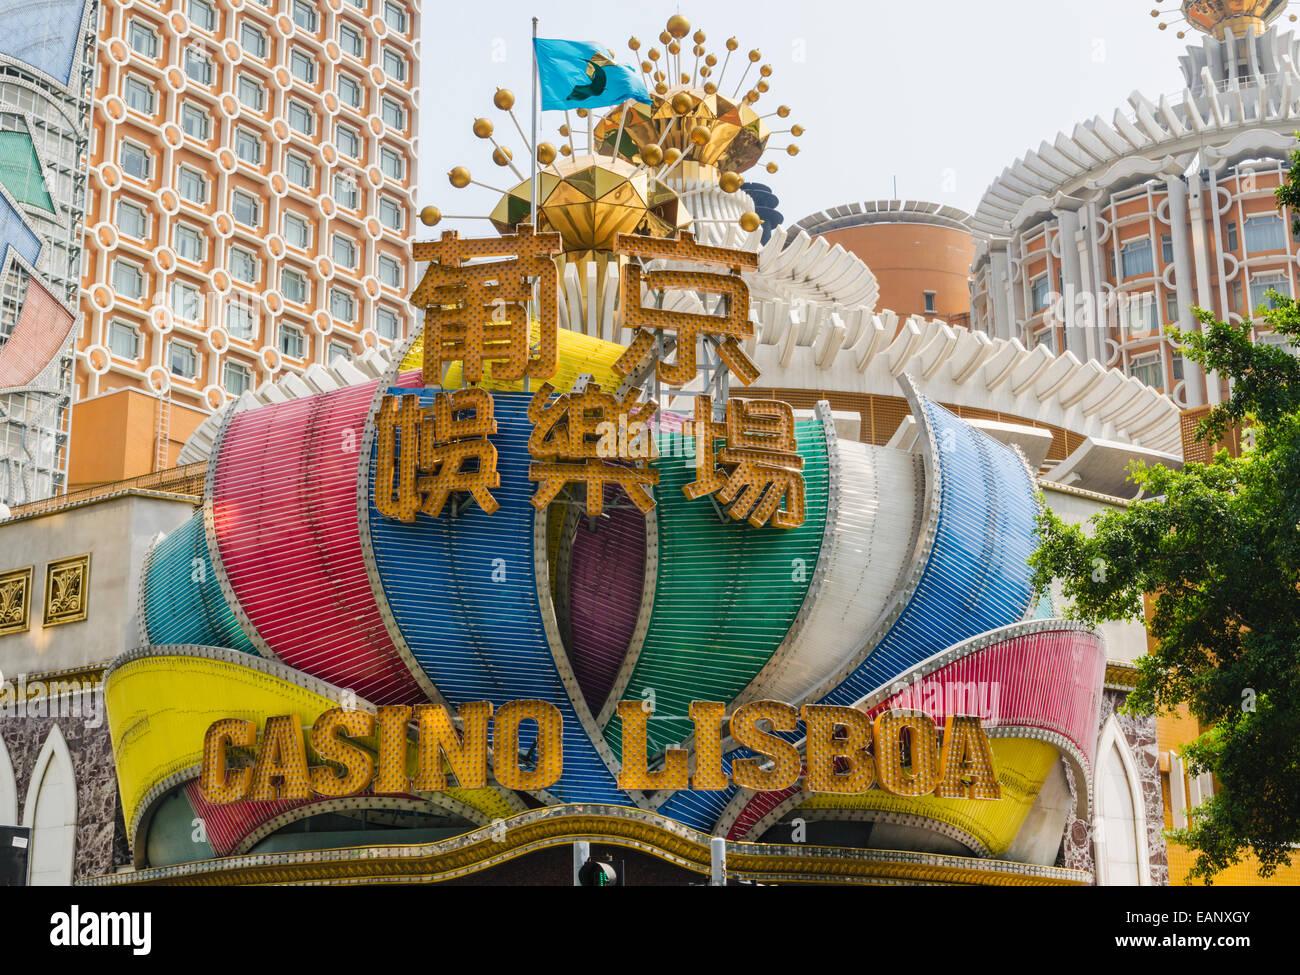 Entrada al Casino Lisboa, Macao, China Imagen De Stock